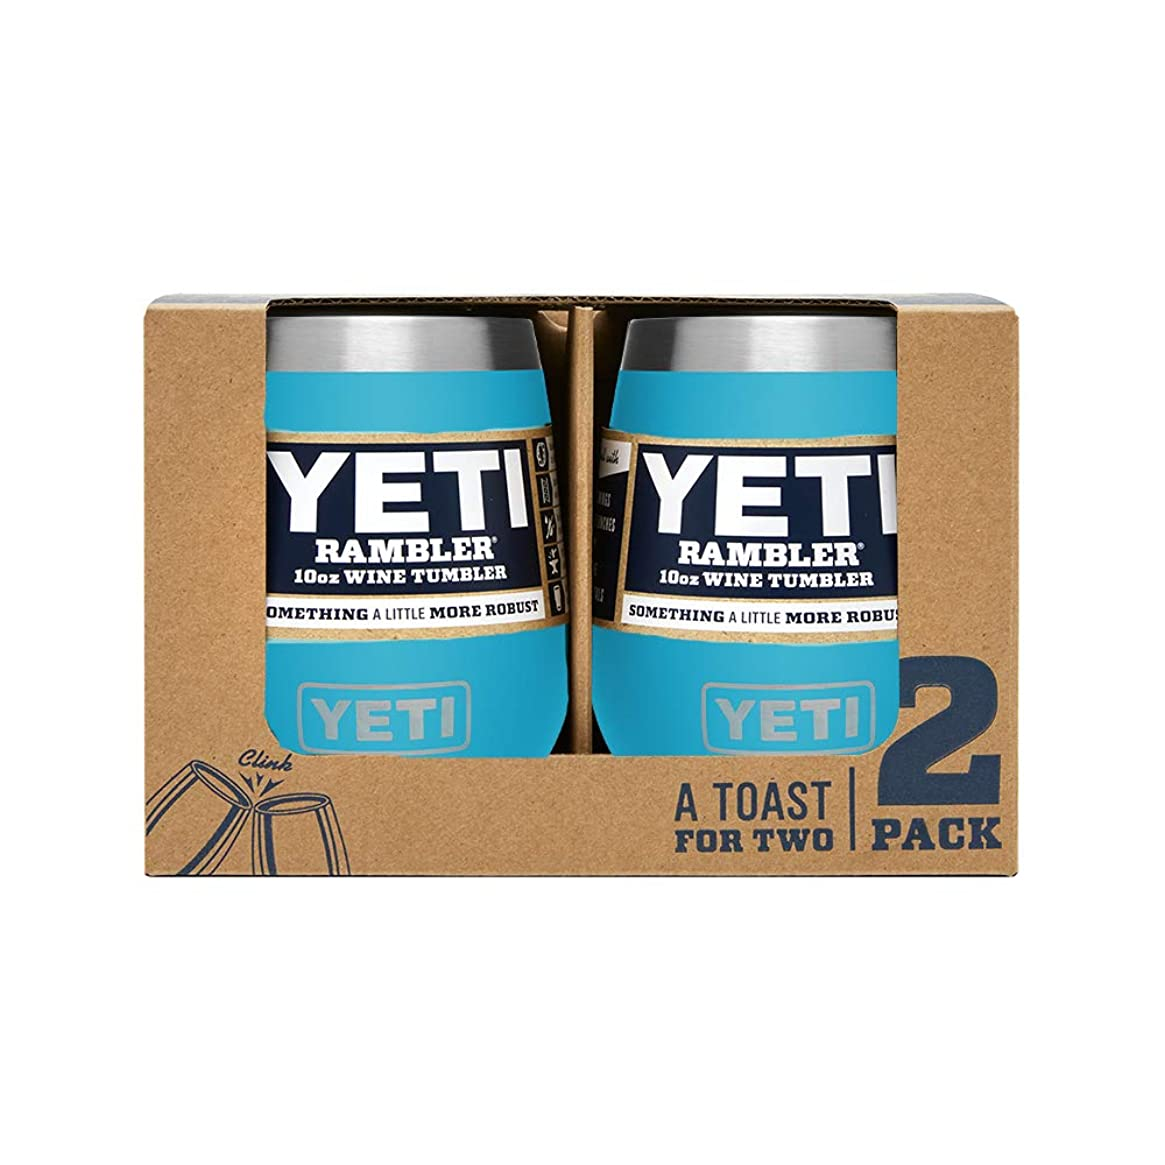 YETI Rambler 10 oz Stainless Steel Vacuum Insulated Wine Tumbler, 2 Pack, Reef Blue